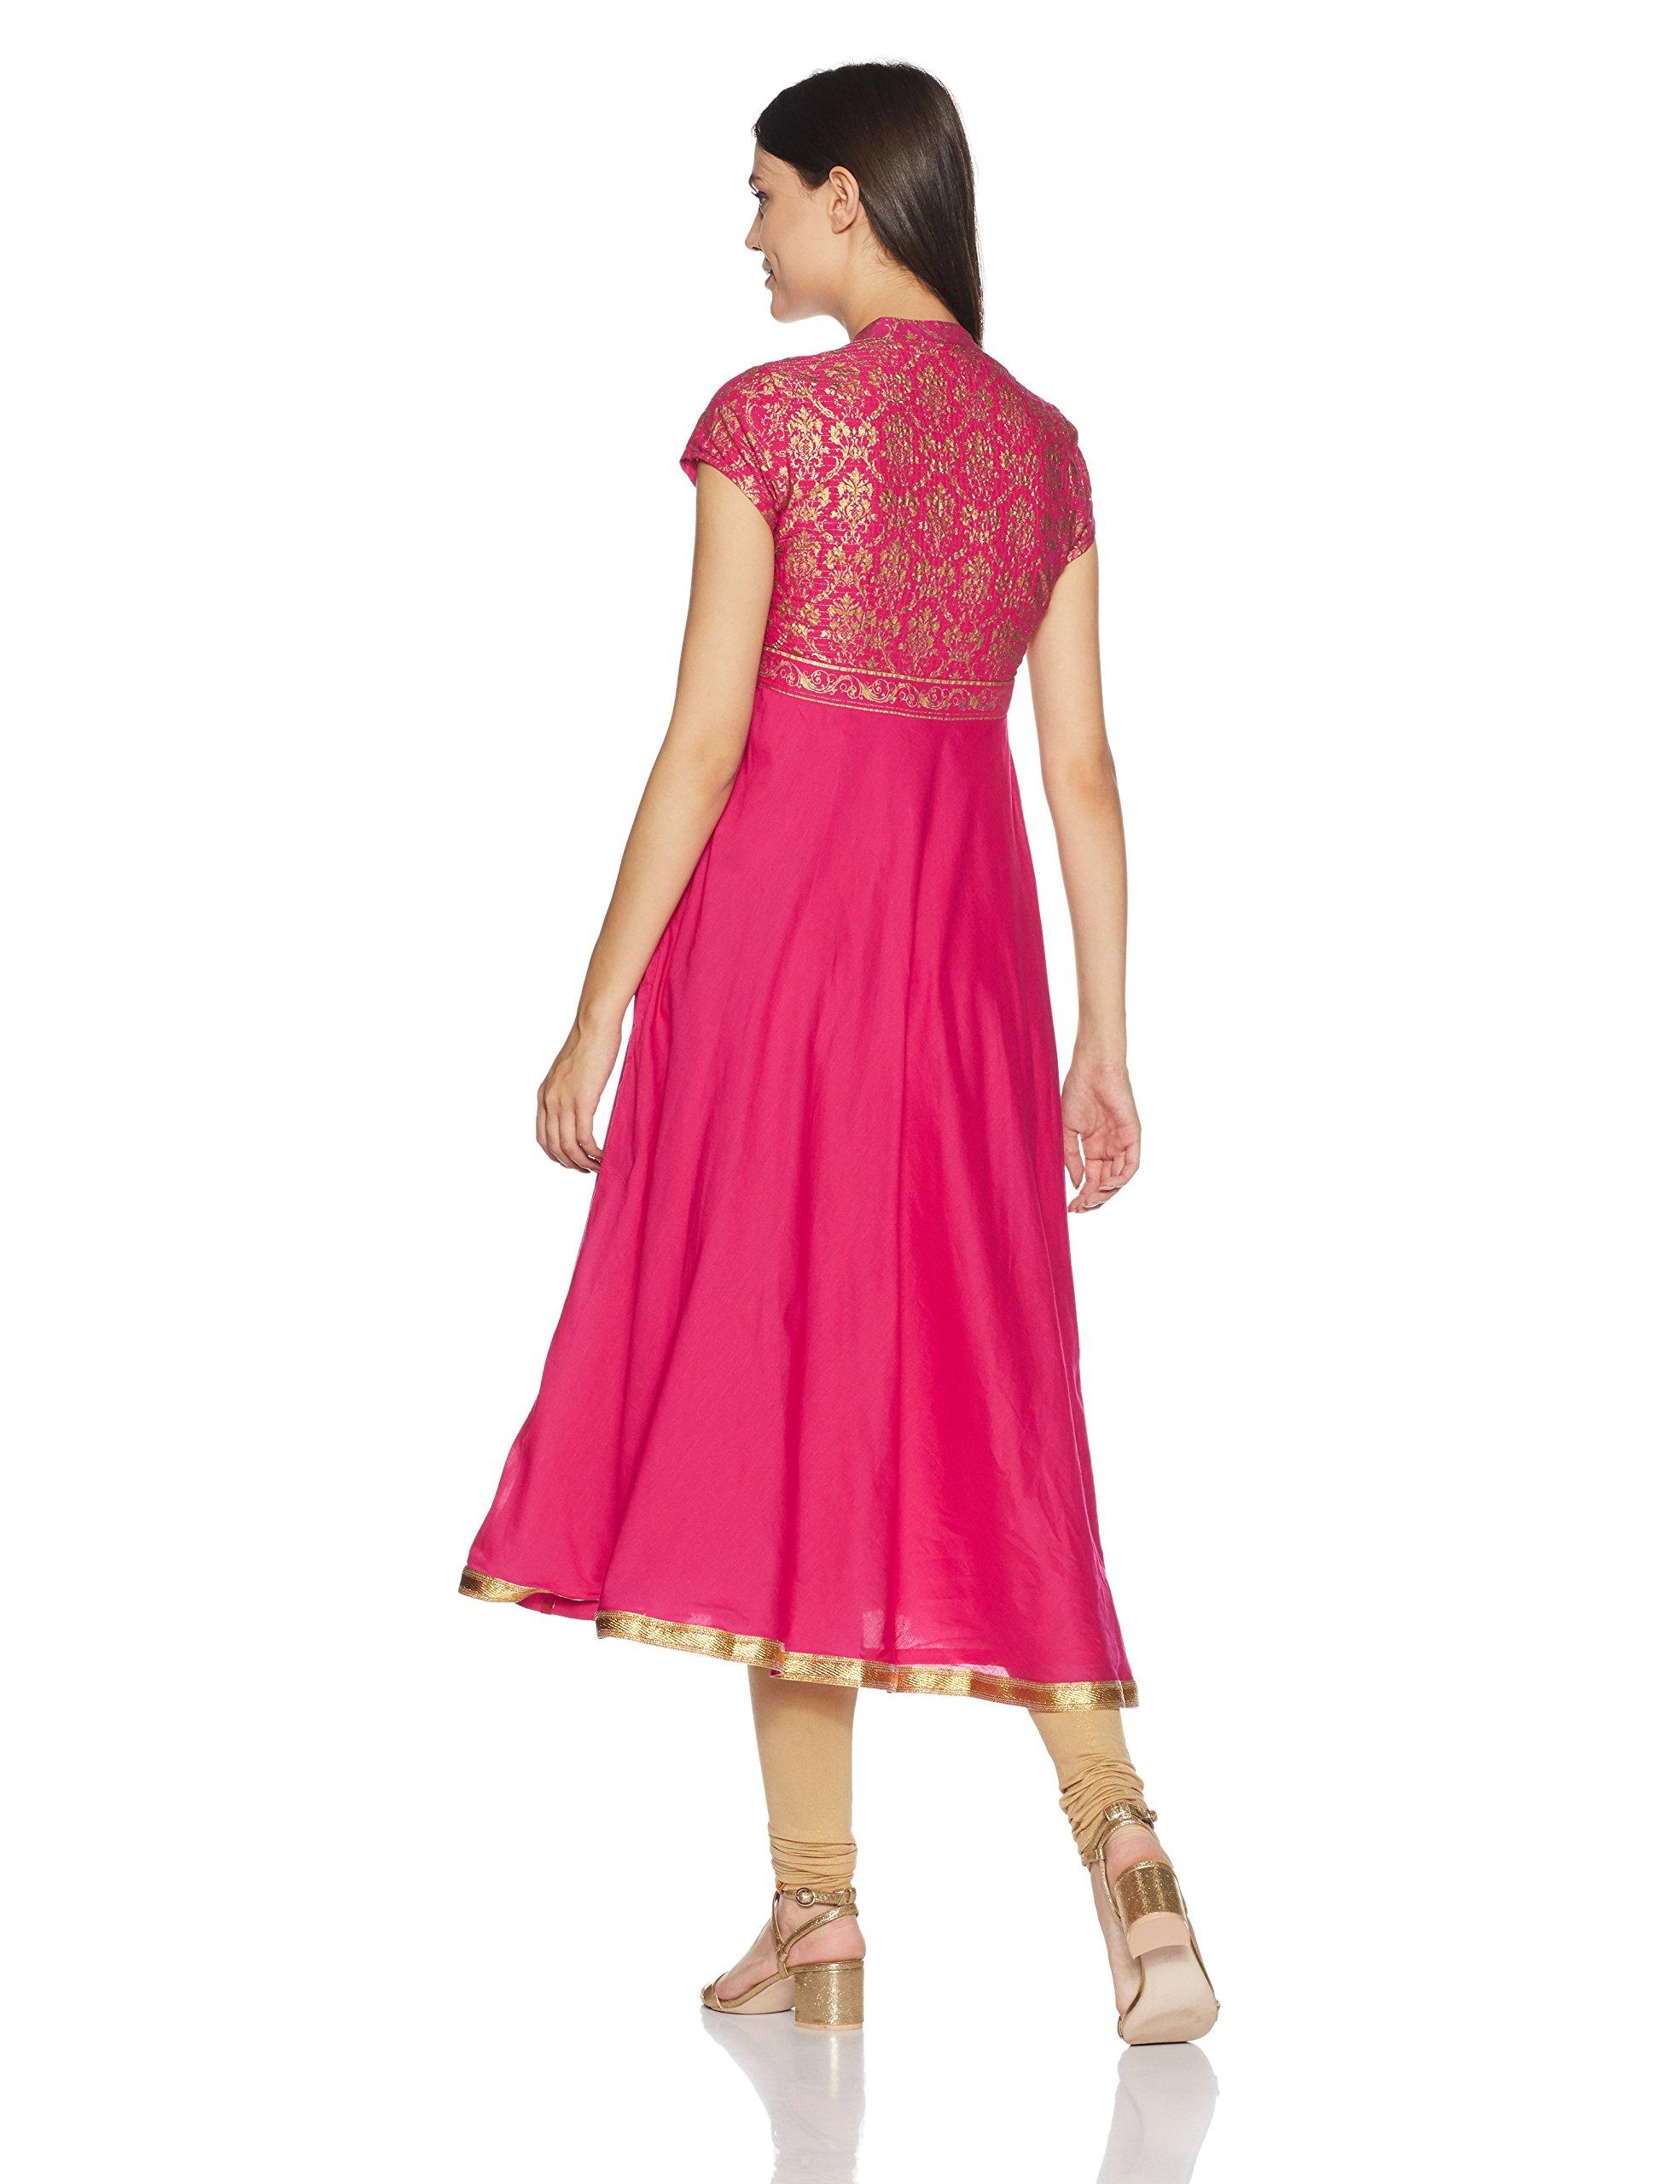 BIBA Women's Anarkali Cotton Kurta 34 Pink by Biba (Image #2)